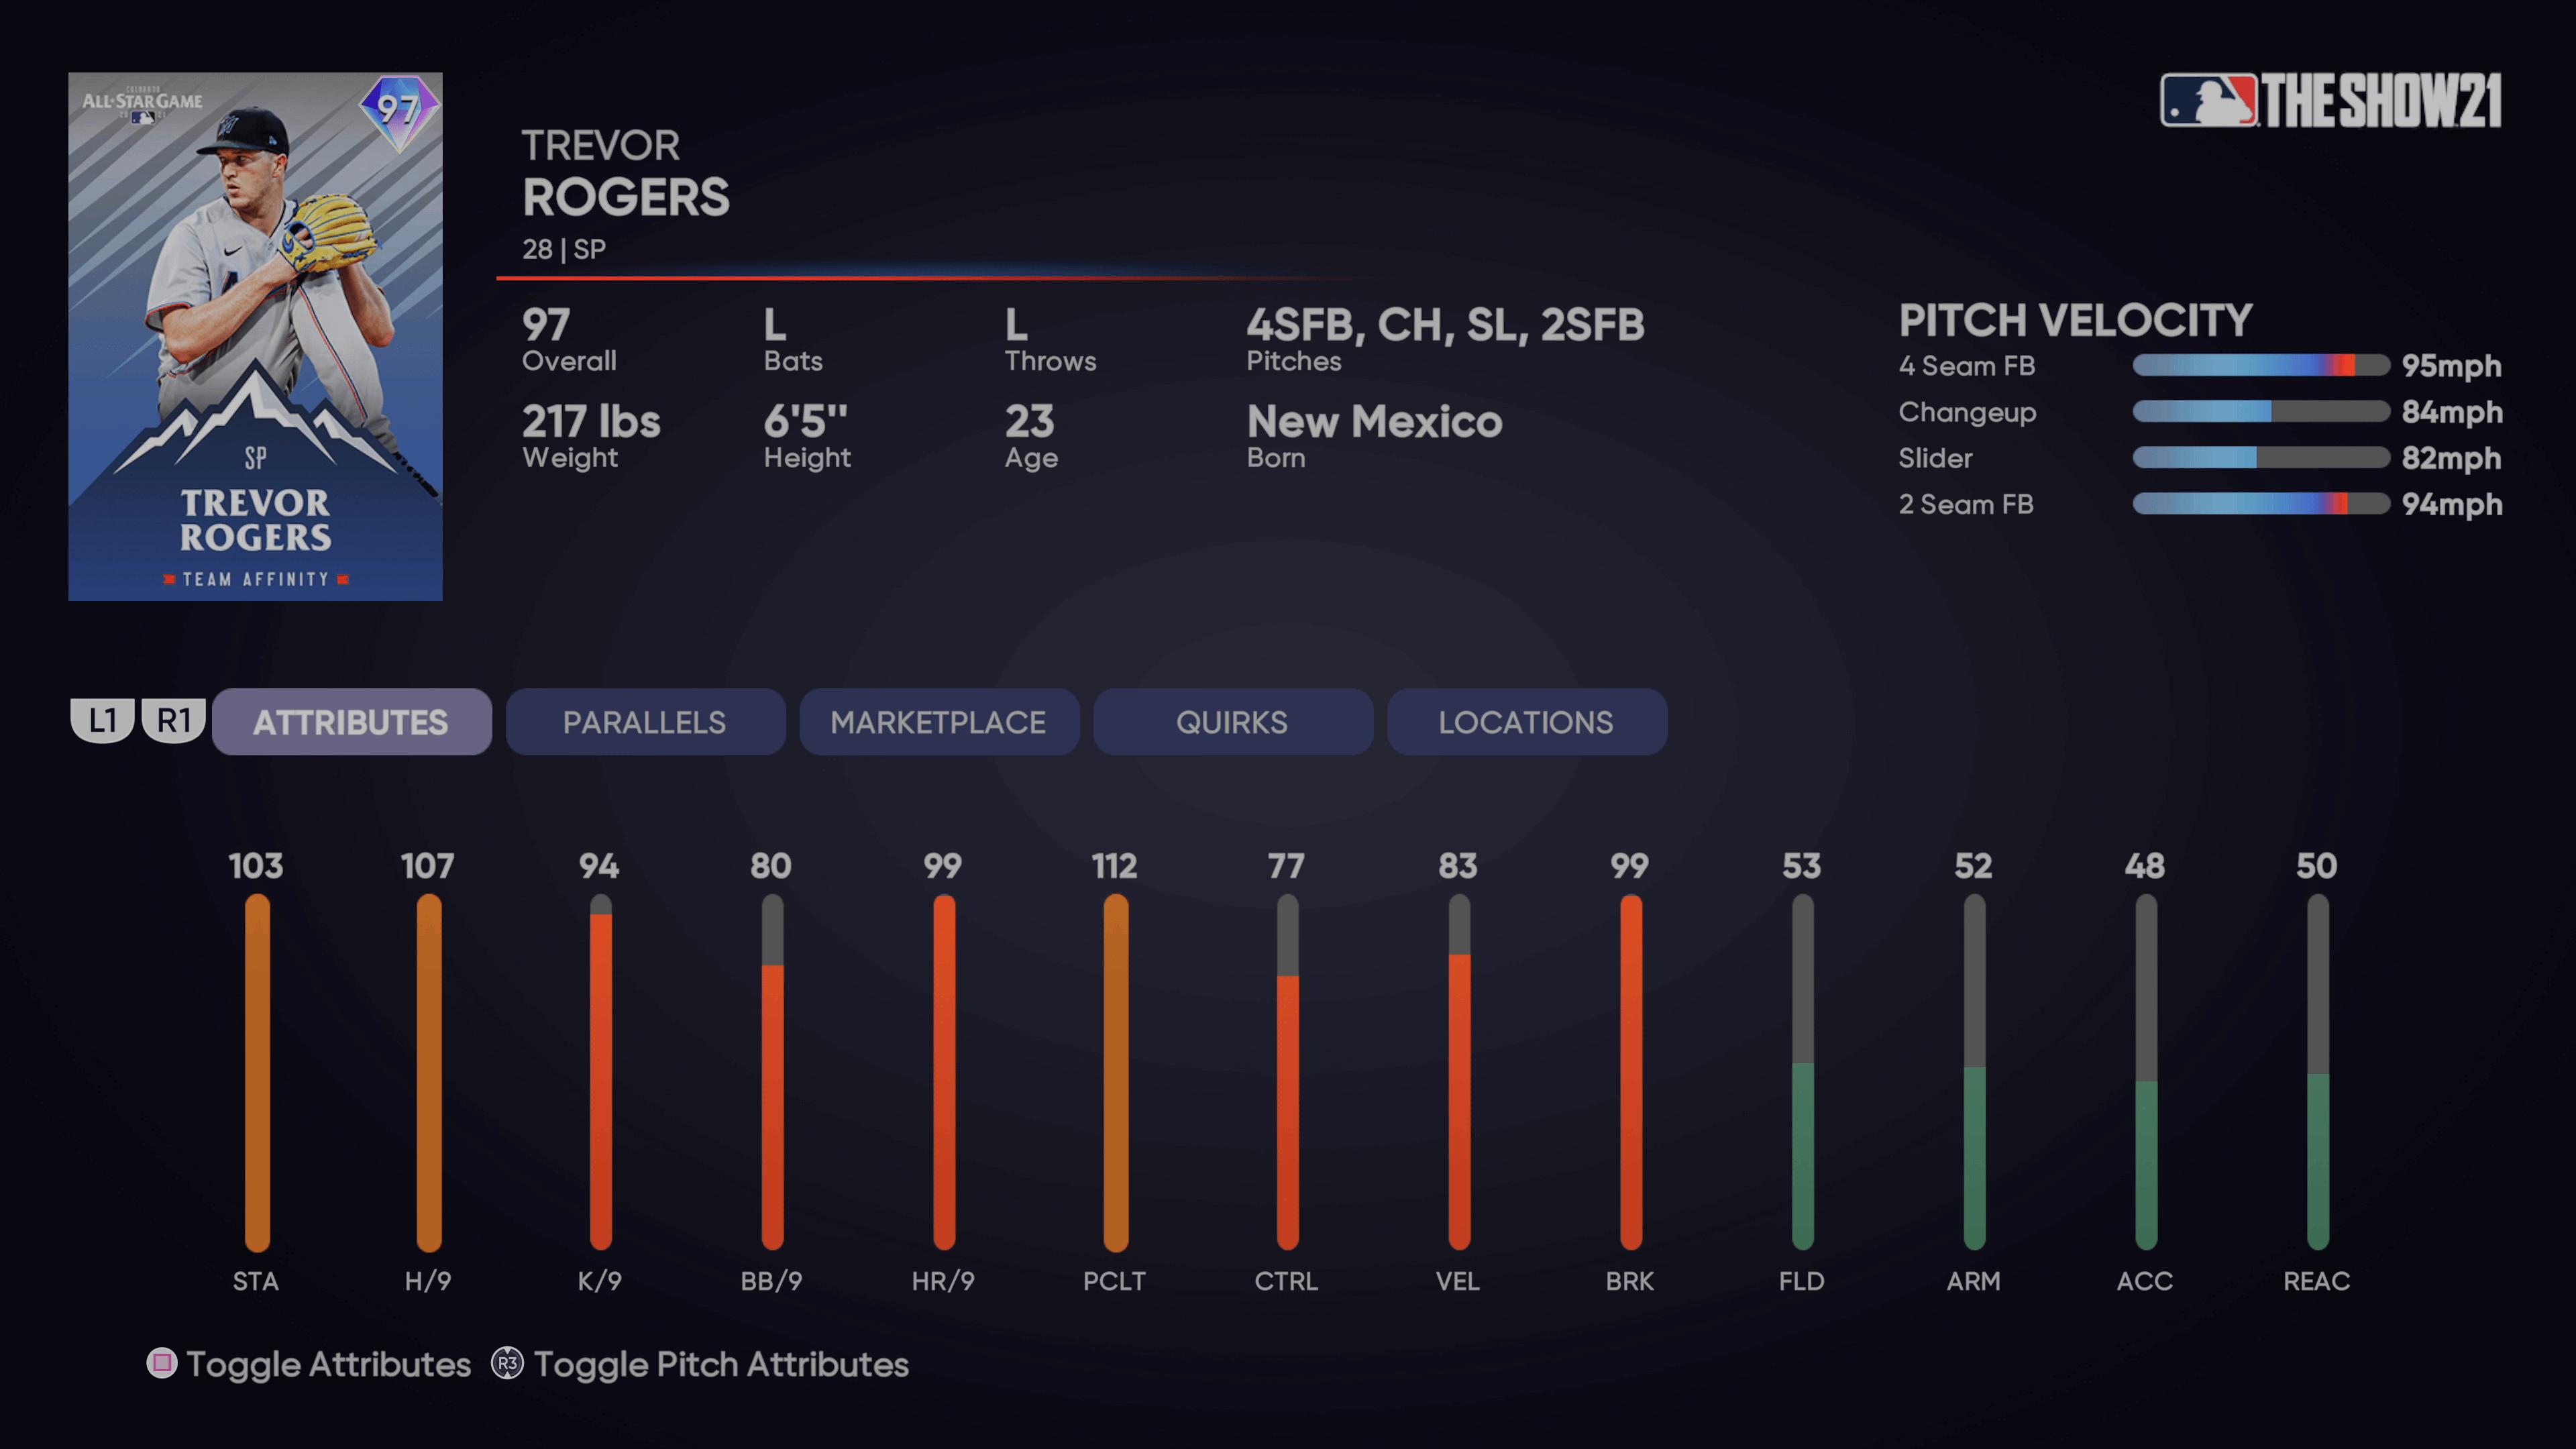 MLB The Show 21 - Team Affinity Season 3_2021-07-12_15-18-15